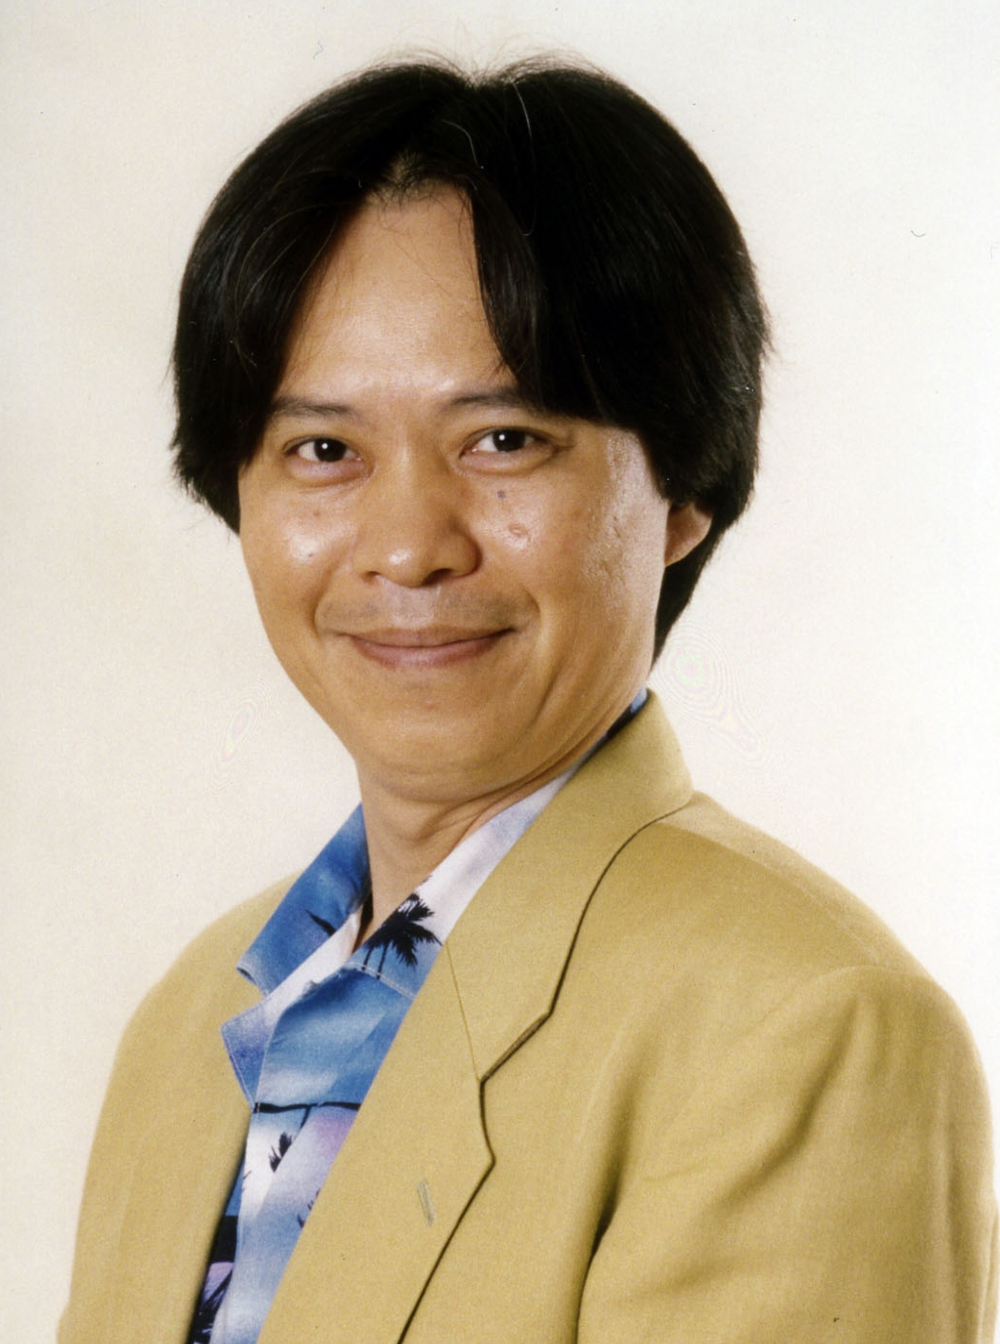 File:HideyukiUmezu.png